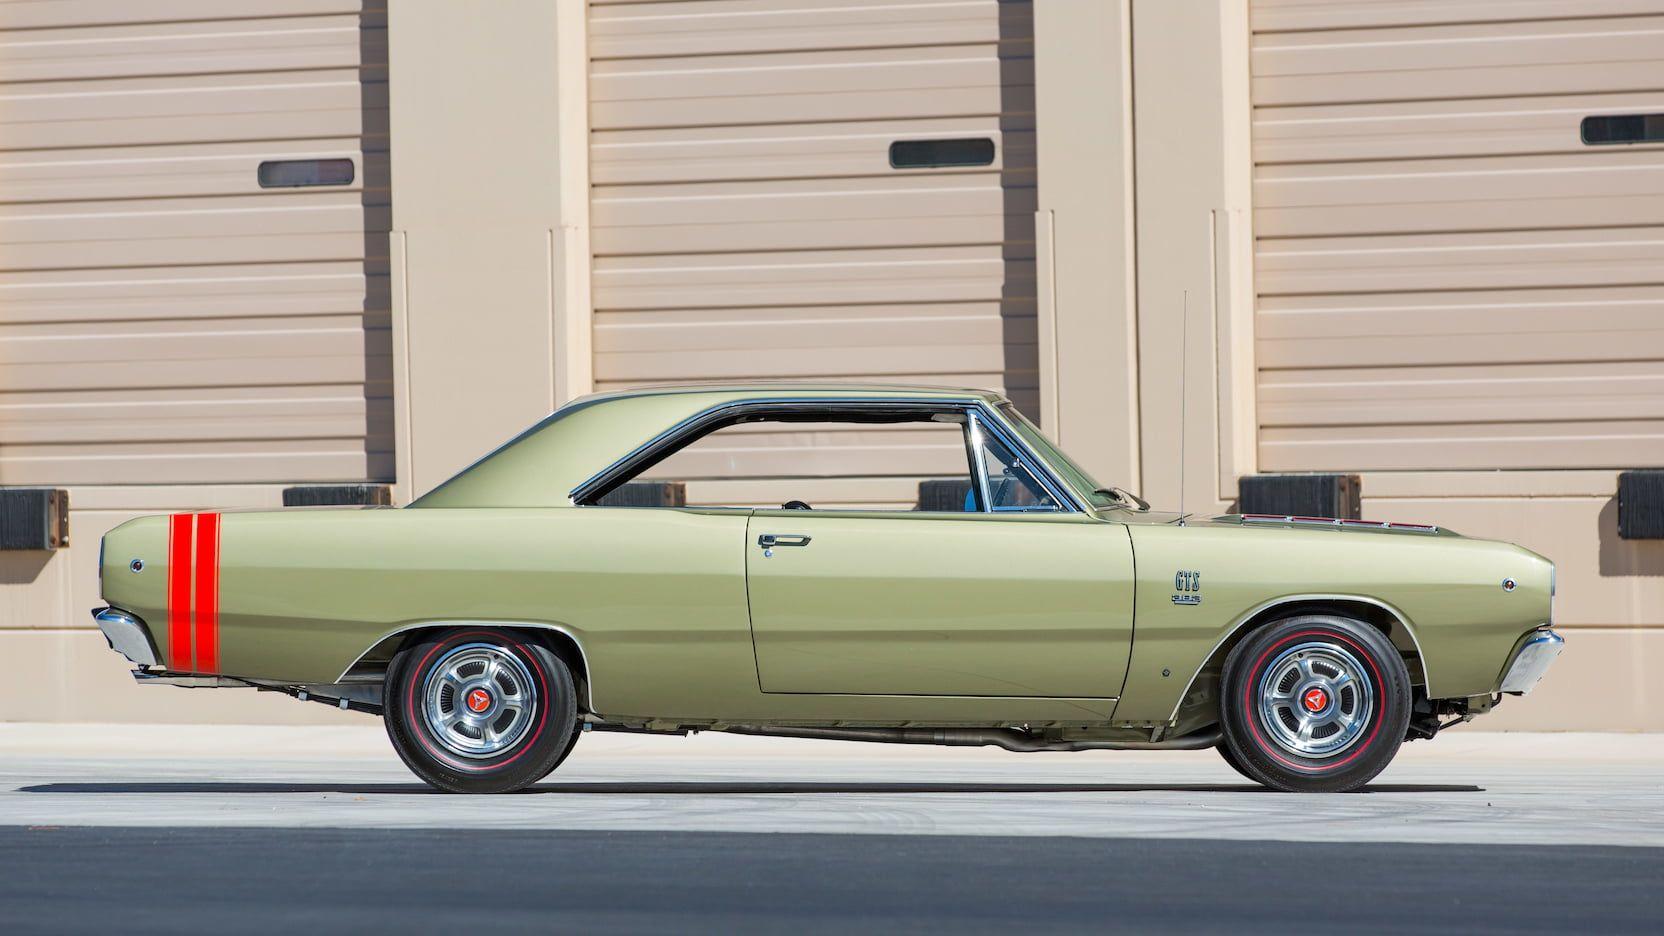 1968 Dodge Dart Gts F99 Las Vegas 2018 Dodge Dart Dodge